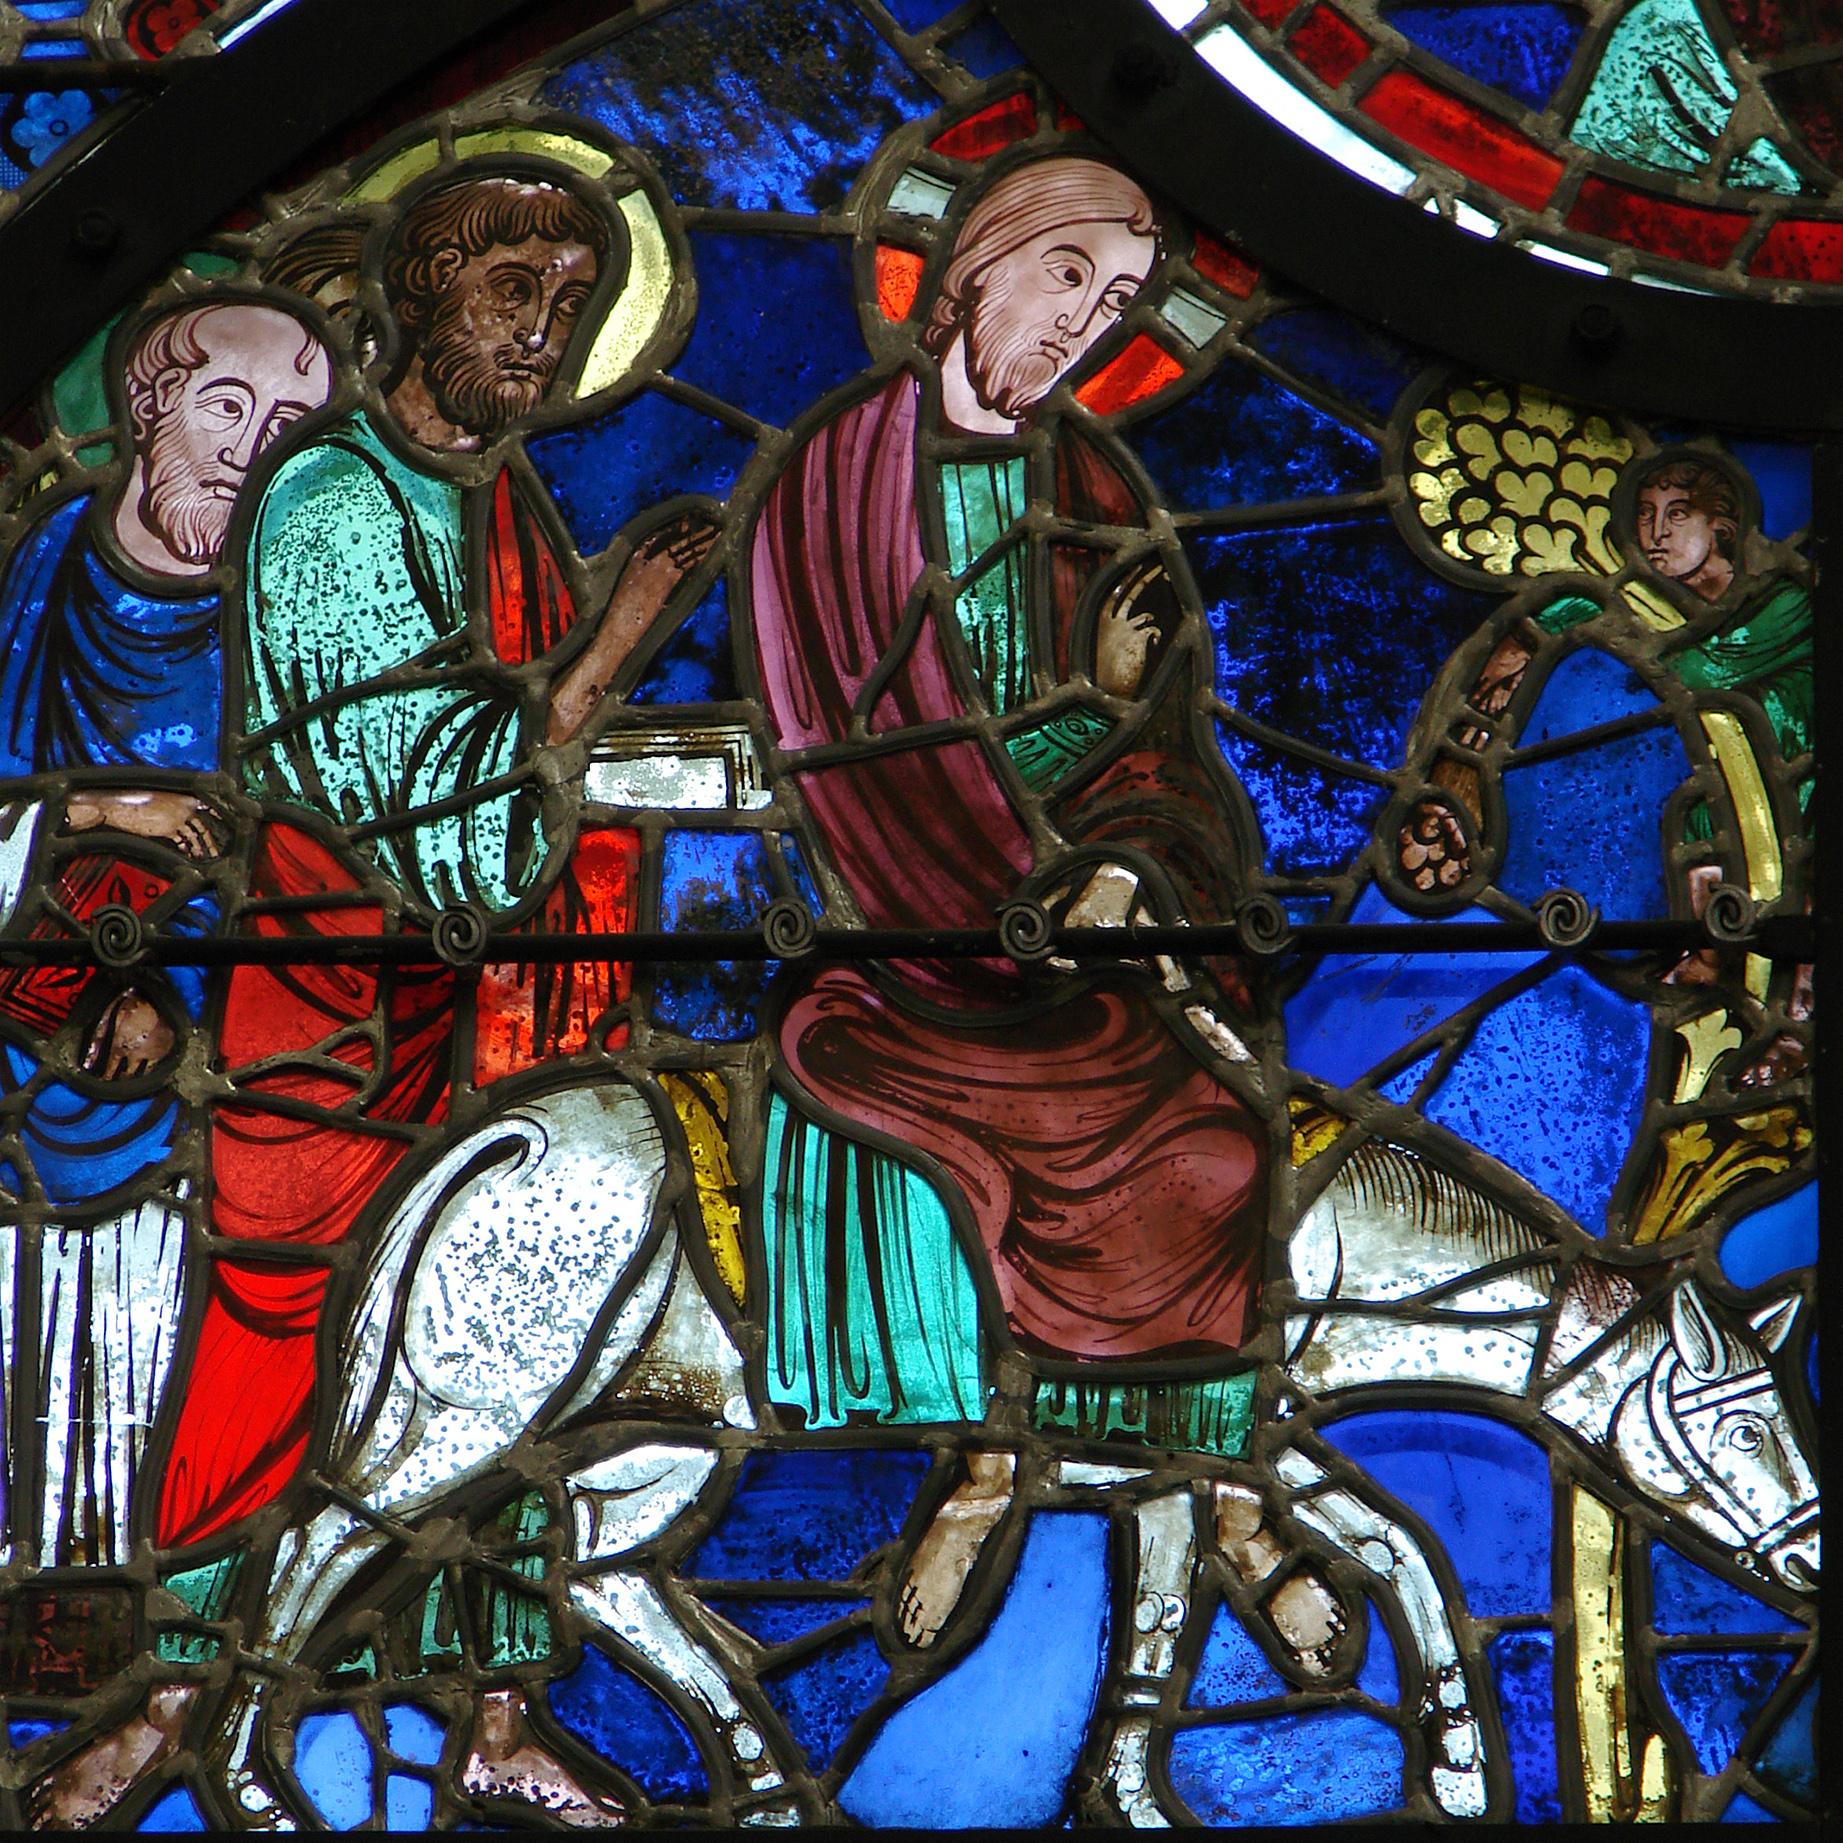 Vitraux Cathédrale de Laon 240808 2.jpg